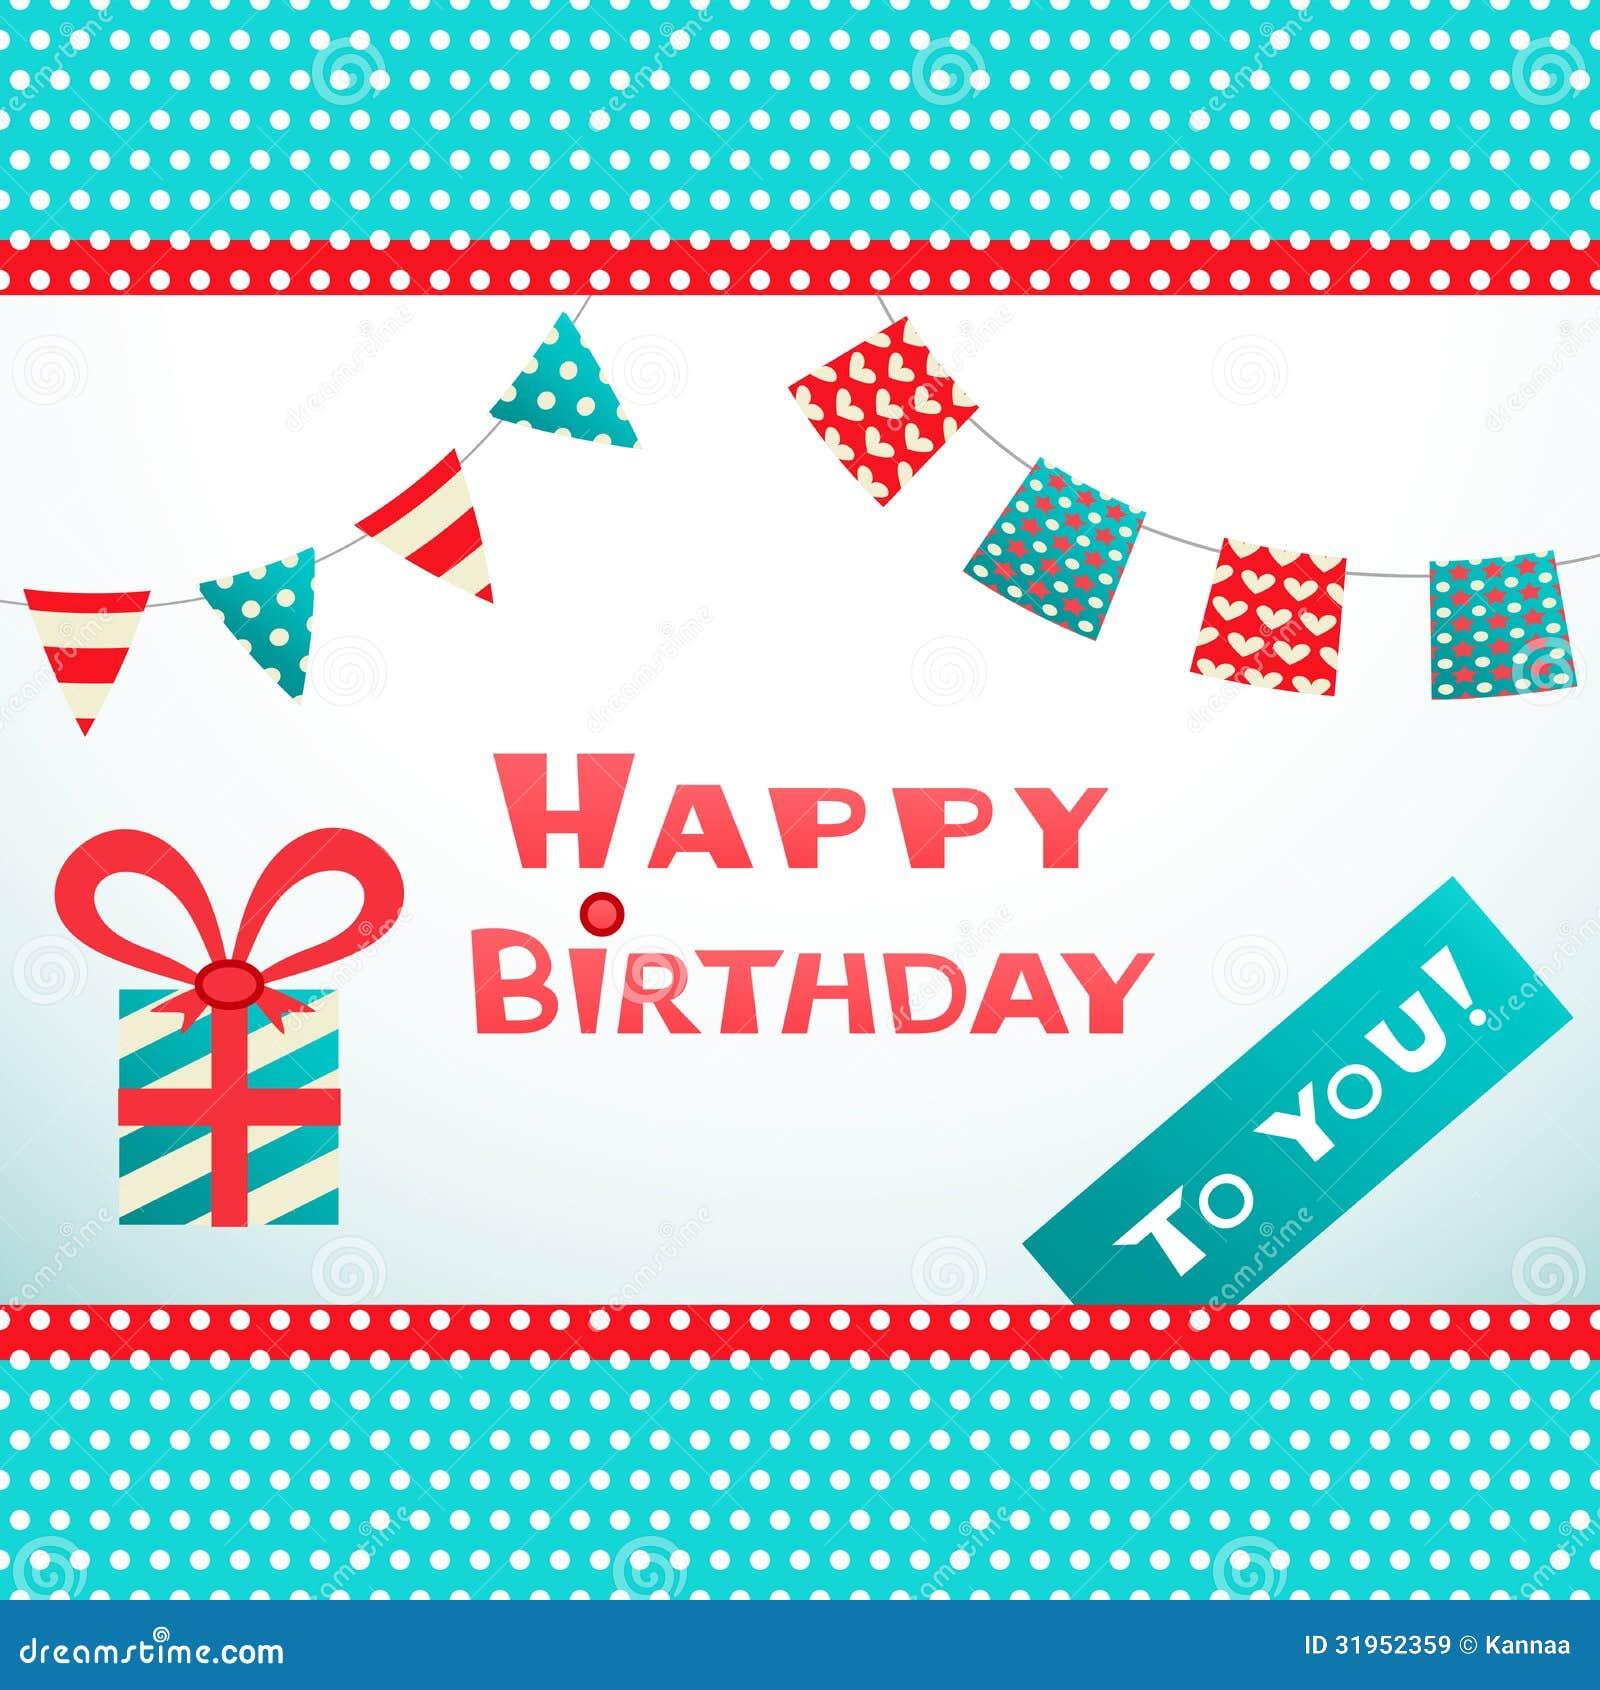 Happy Birthday Retro Postcard With Dot Textured Royalty Free Stock ...